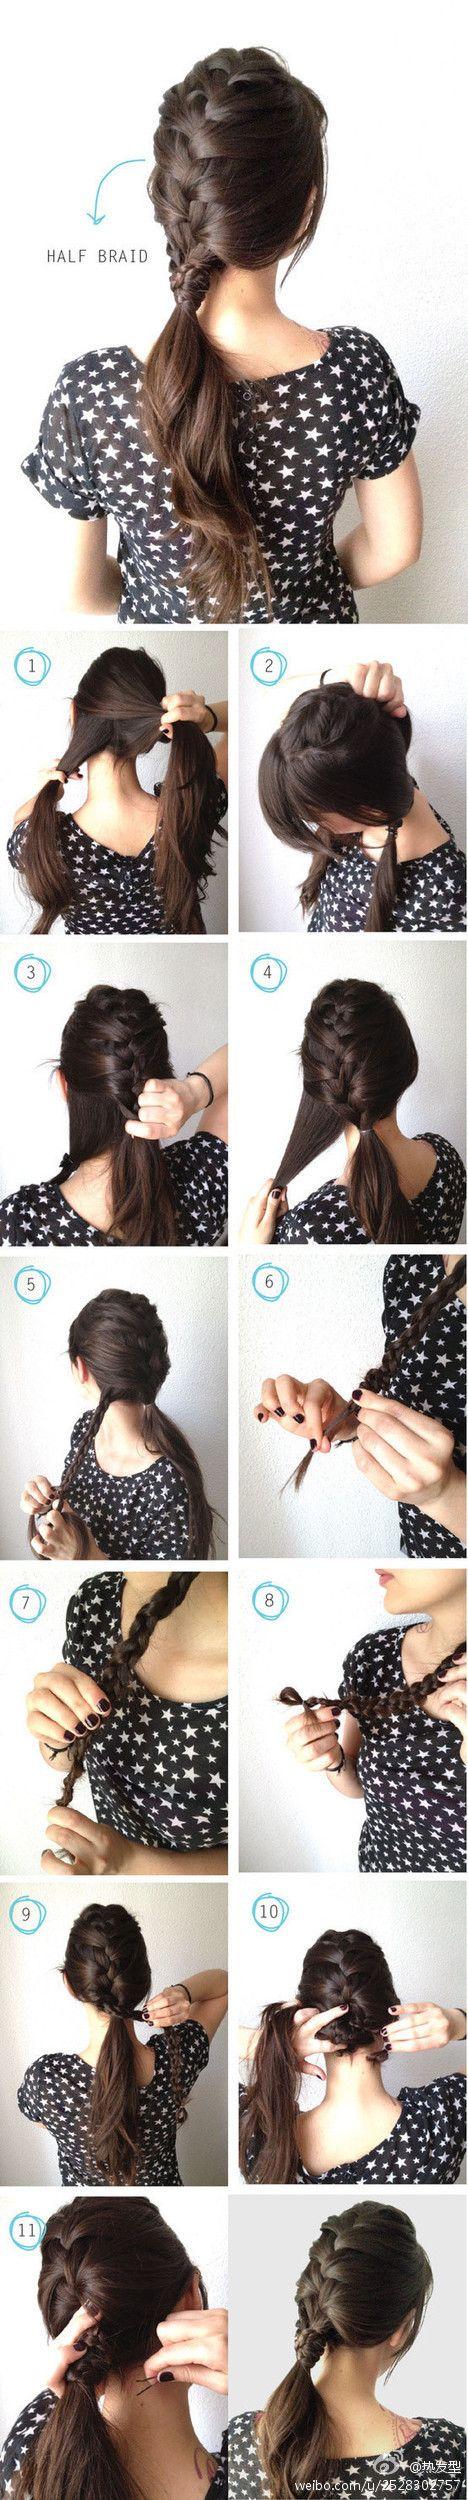 DIY Half Braid Hairstyle